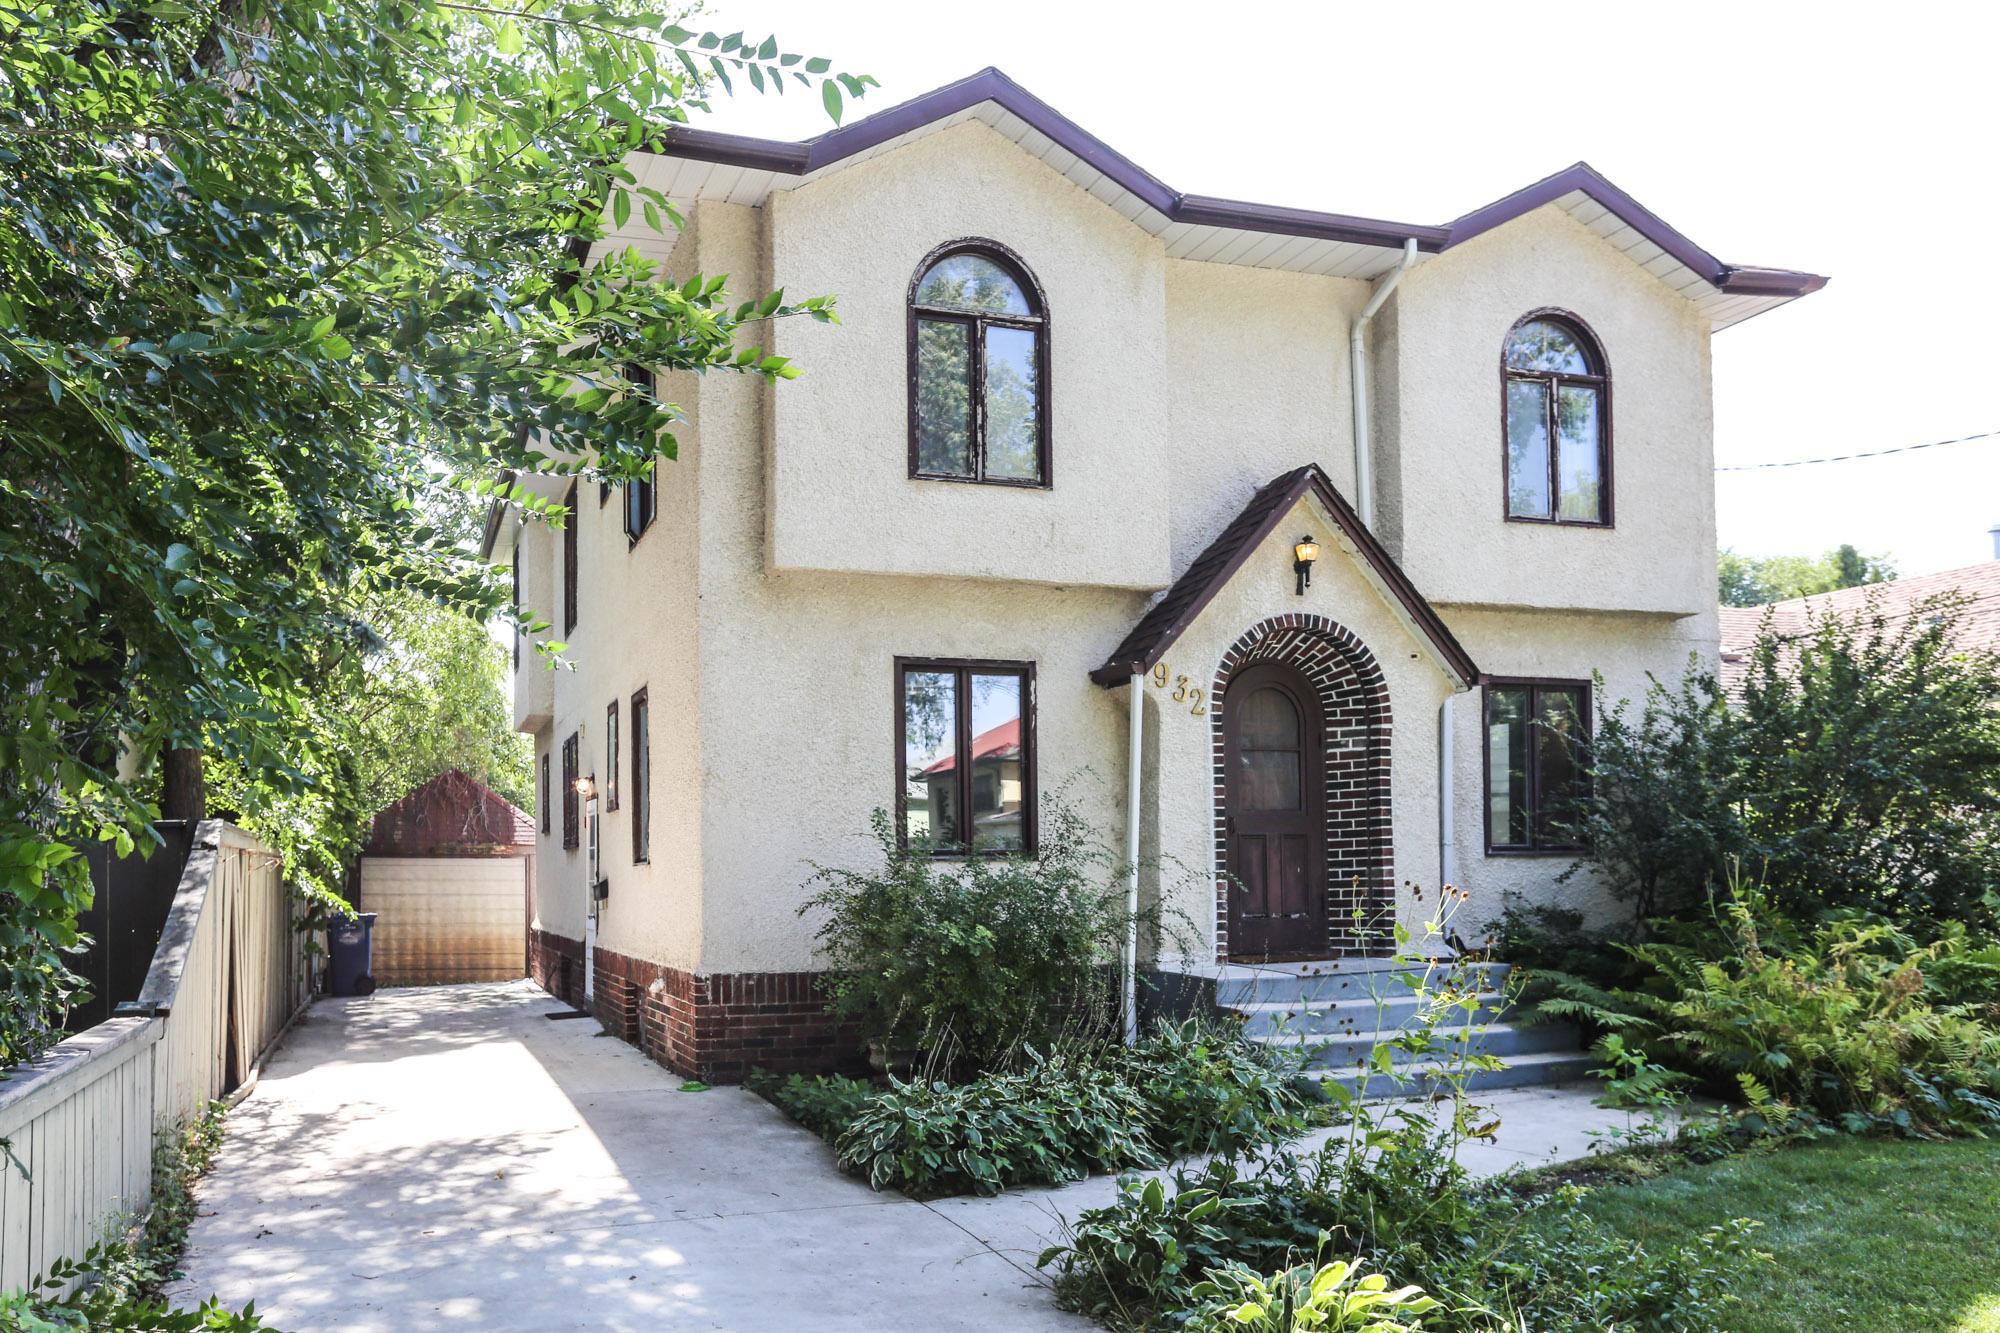 932 Palmerston Ave, Winnipeg, Manitoba  R3G 1J9 - Photo 1 - 1823850